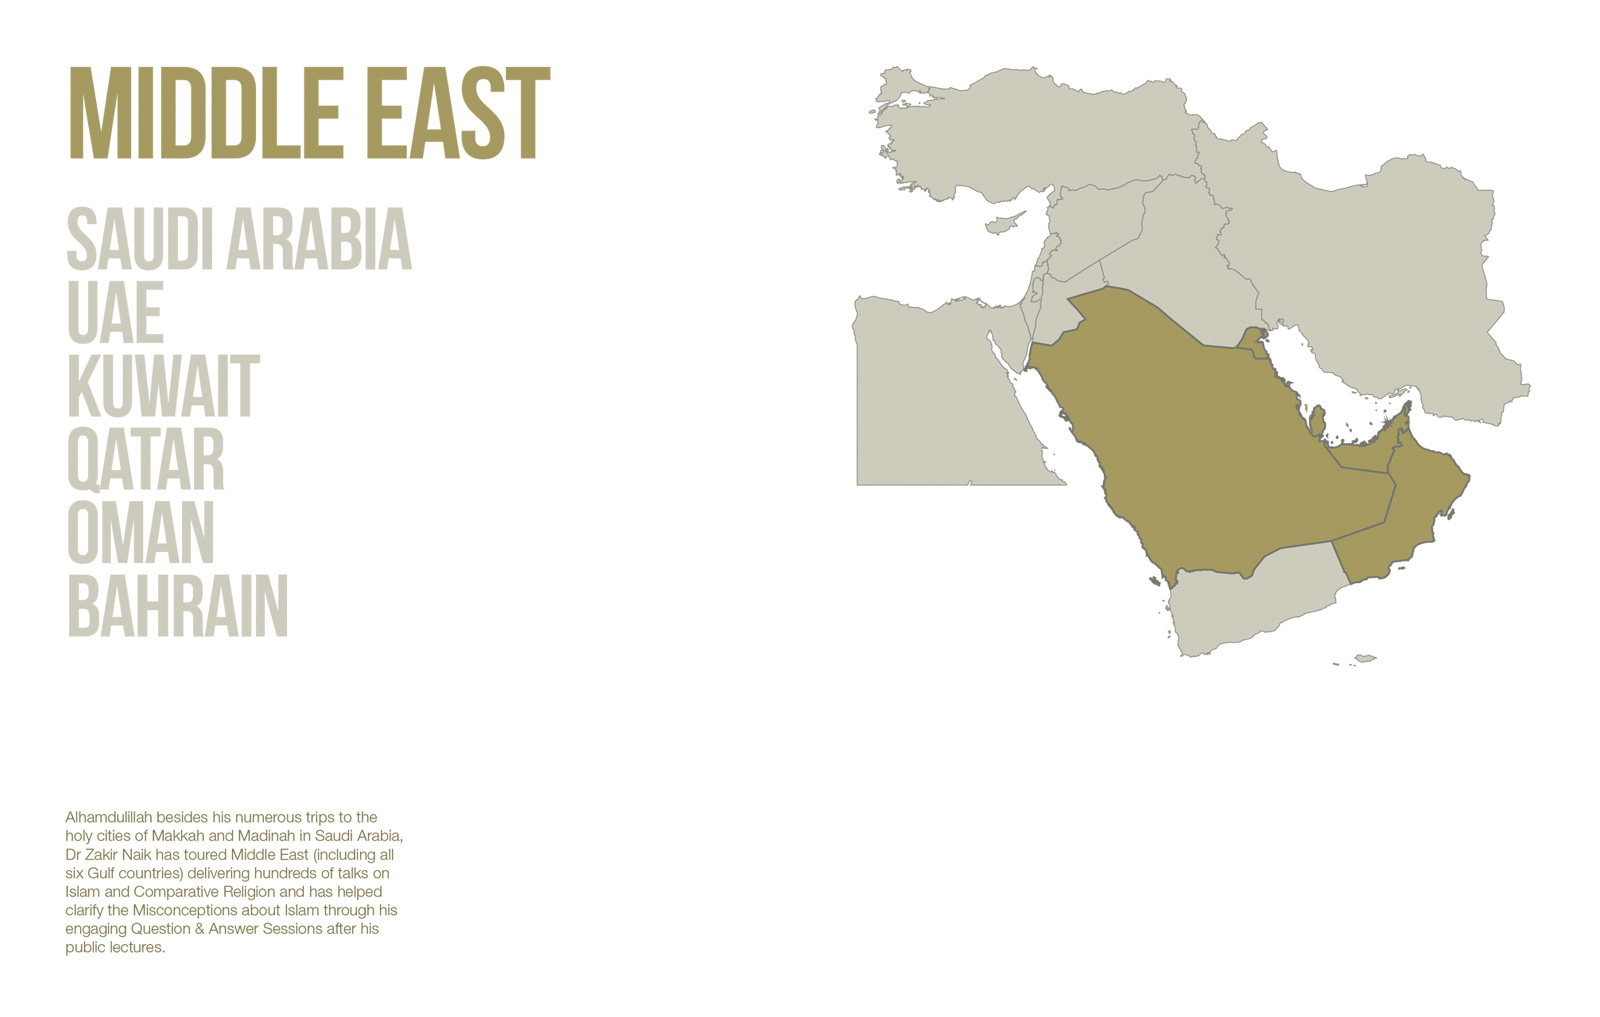 Public Lectures - Middle East